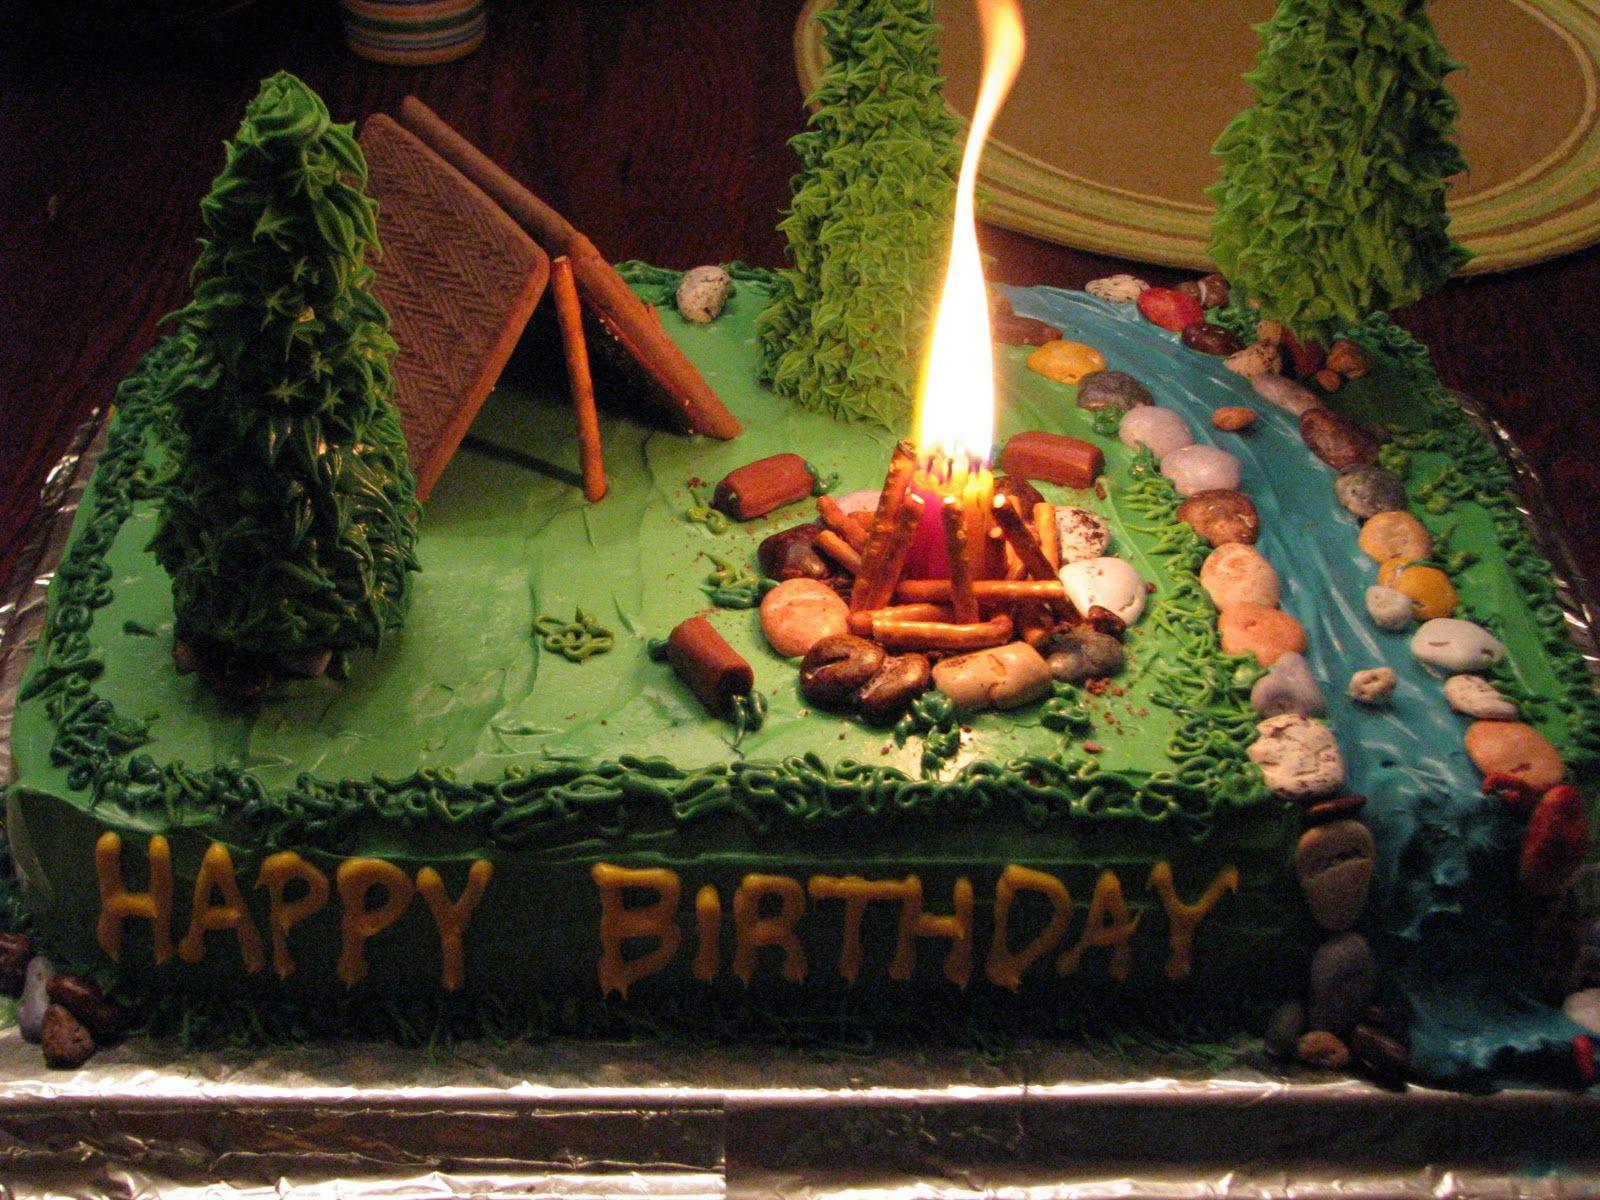 Camping Birthday Cake  Best 25 Camping birthday cake ideas on Pinterest